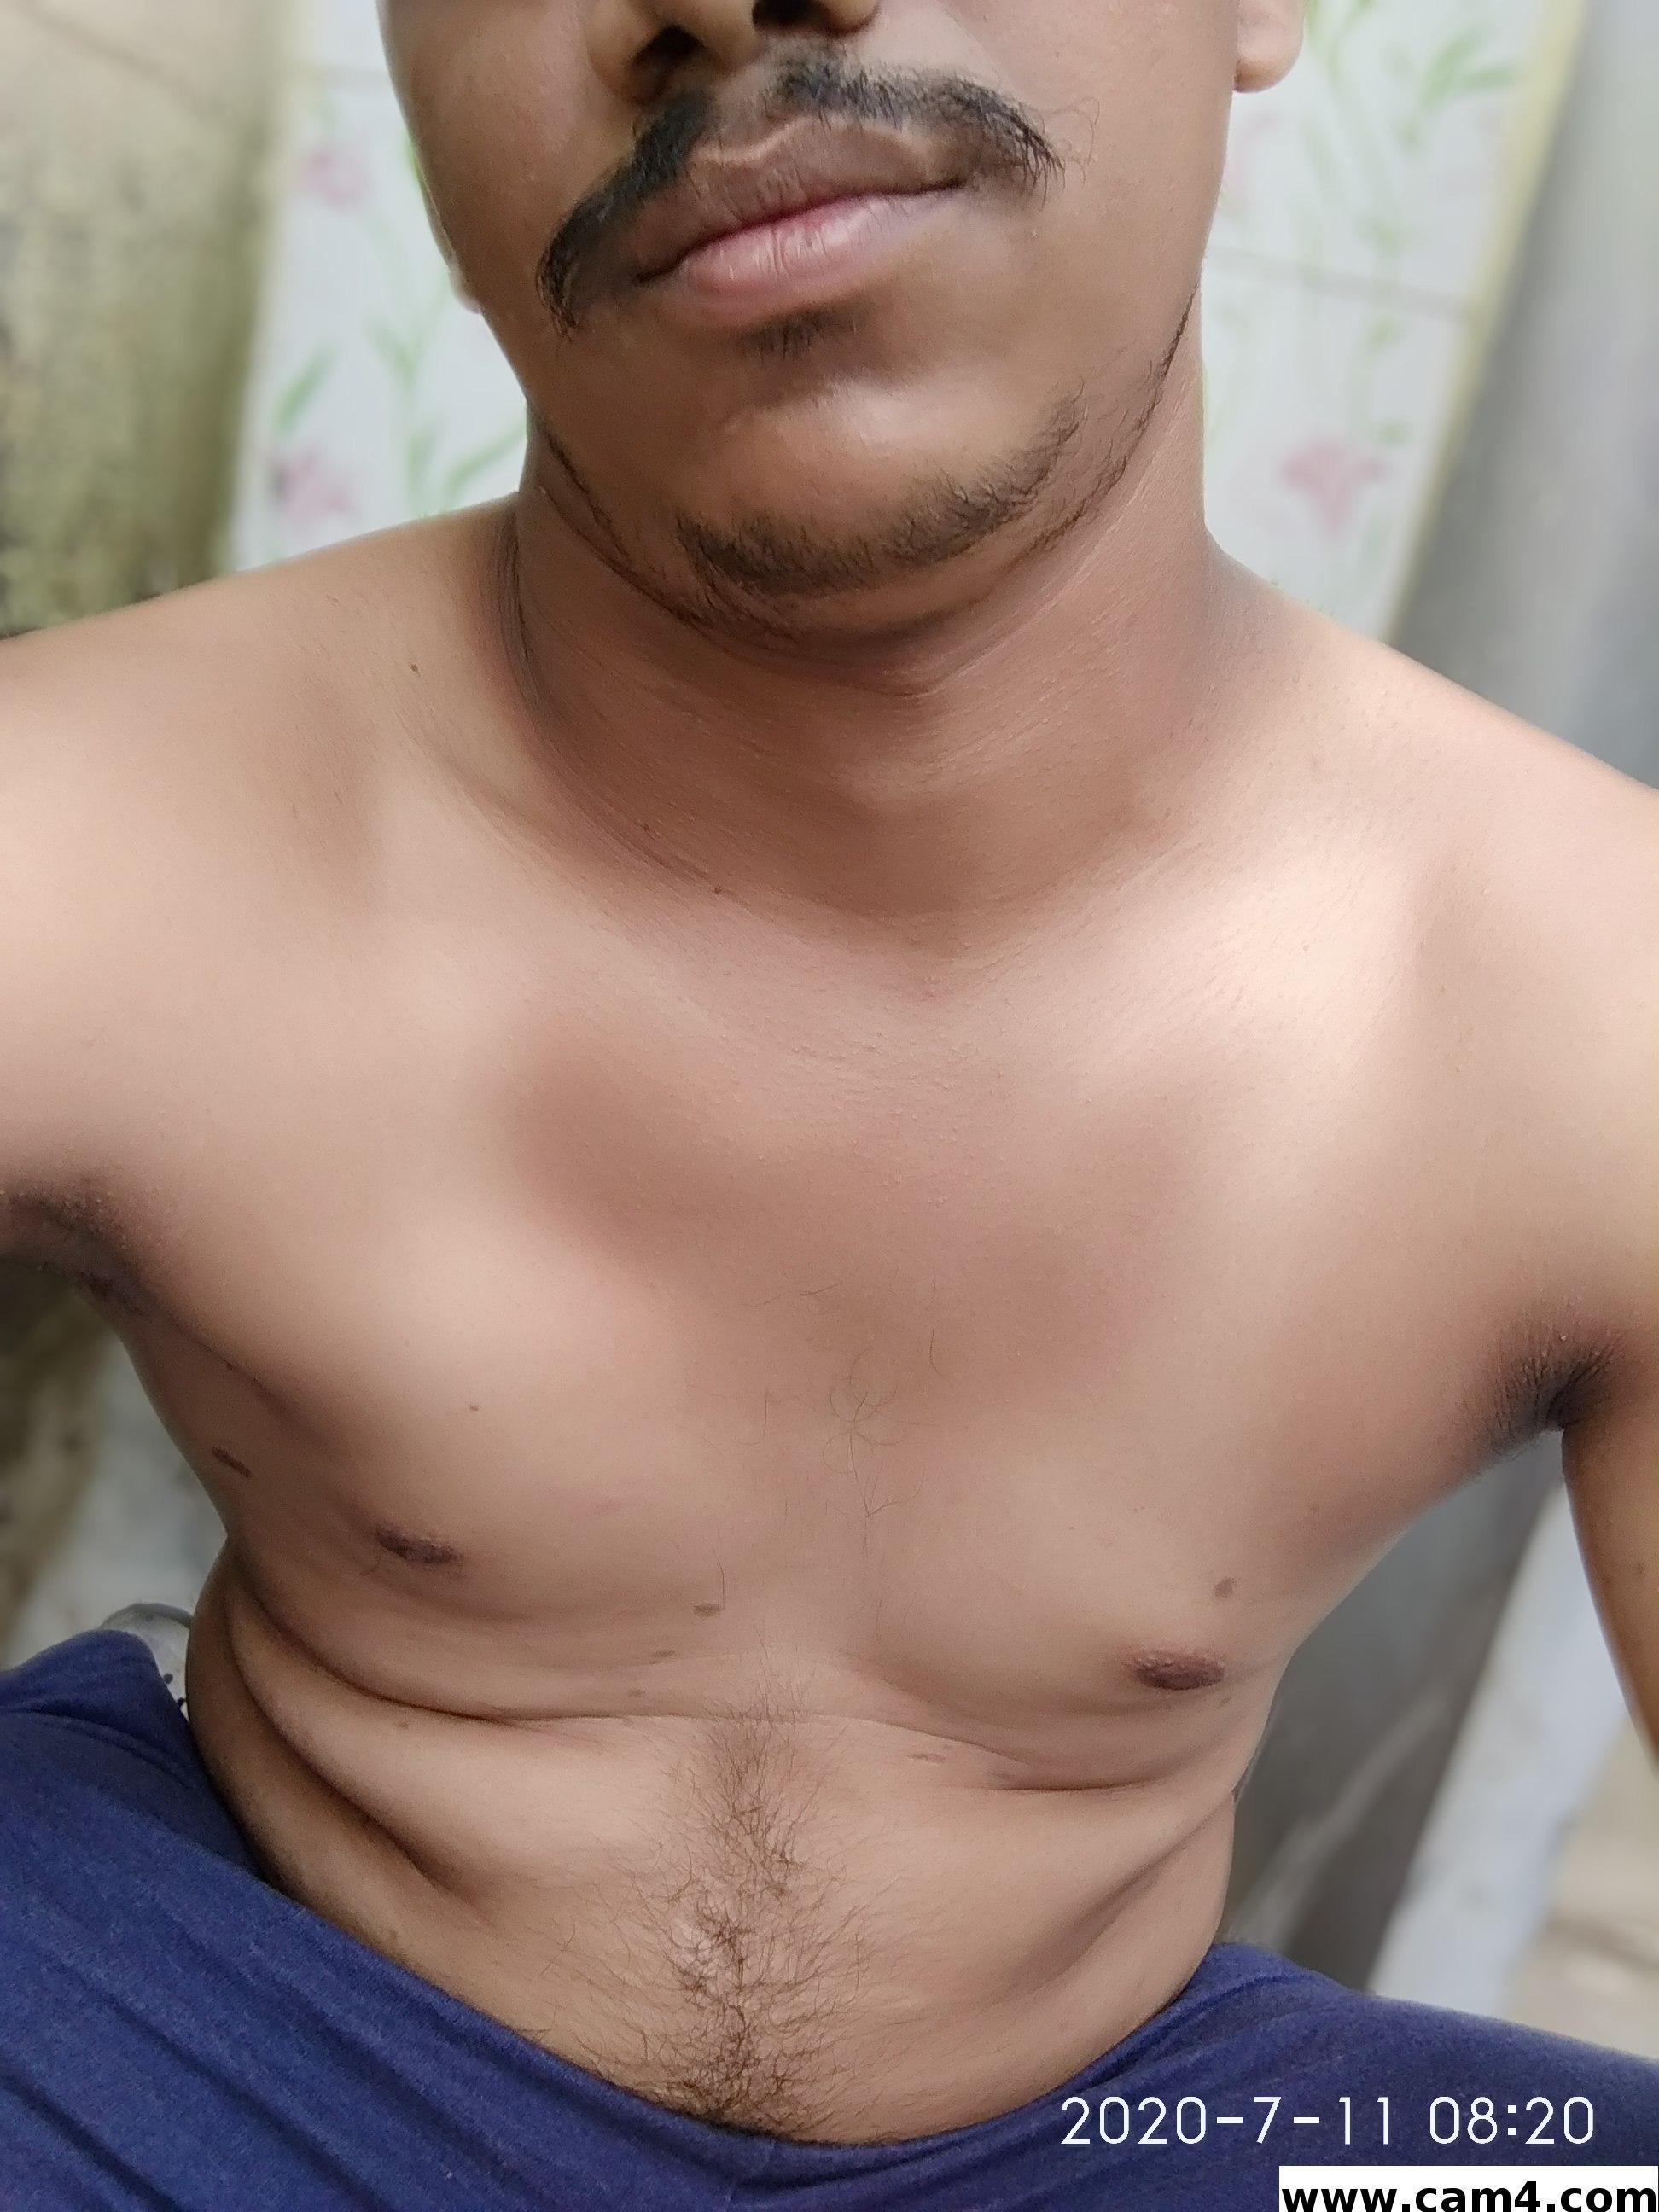 kostenlose panama nackt indian frau bilder